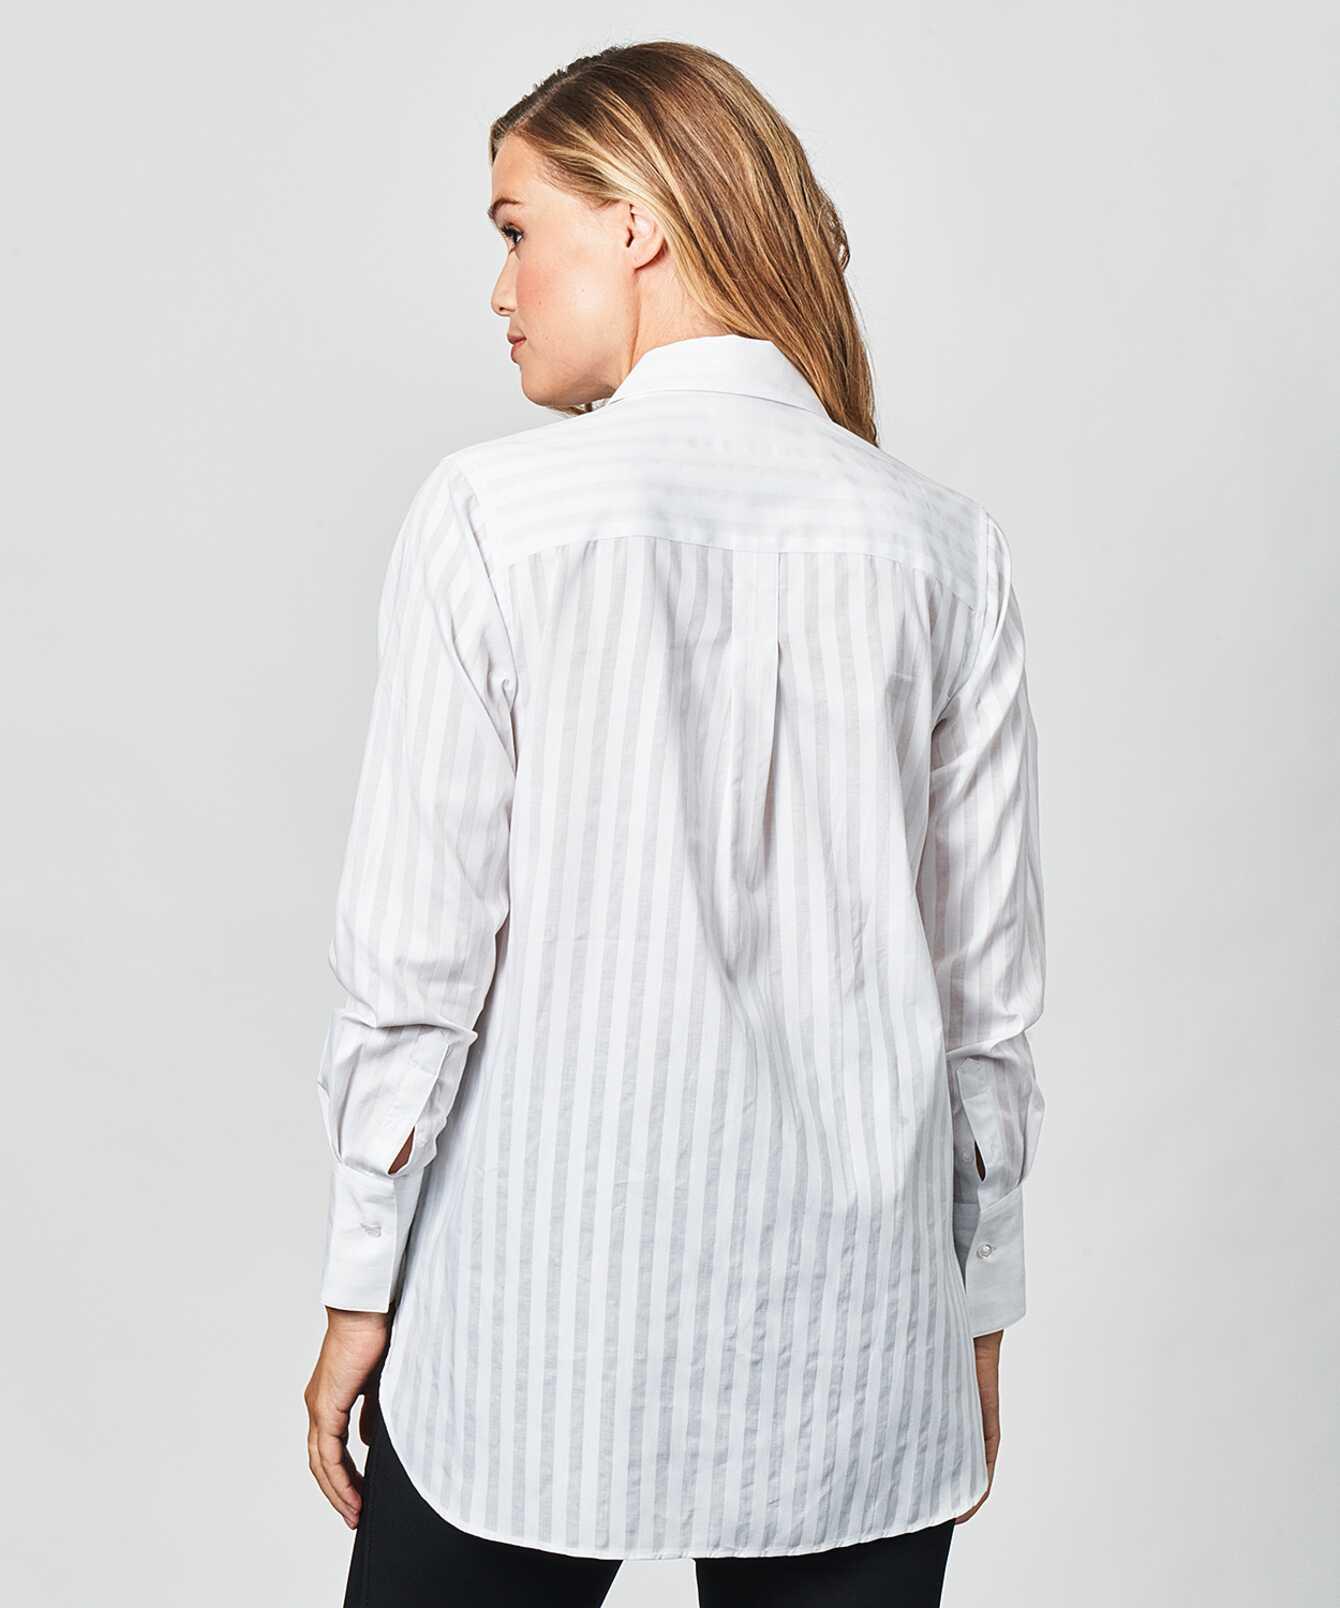 Skjorta Nova Cotton Stripe The Shirt Factory